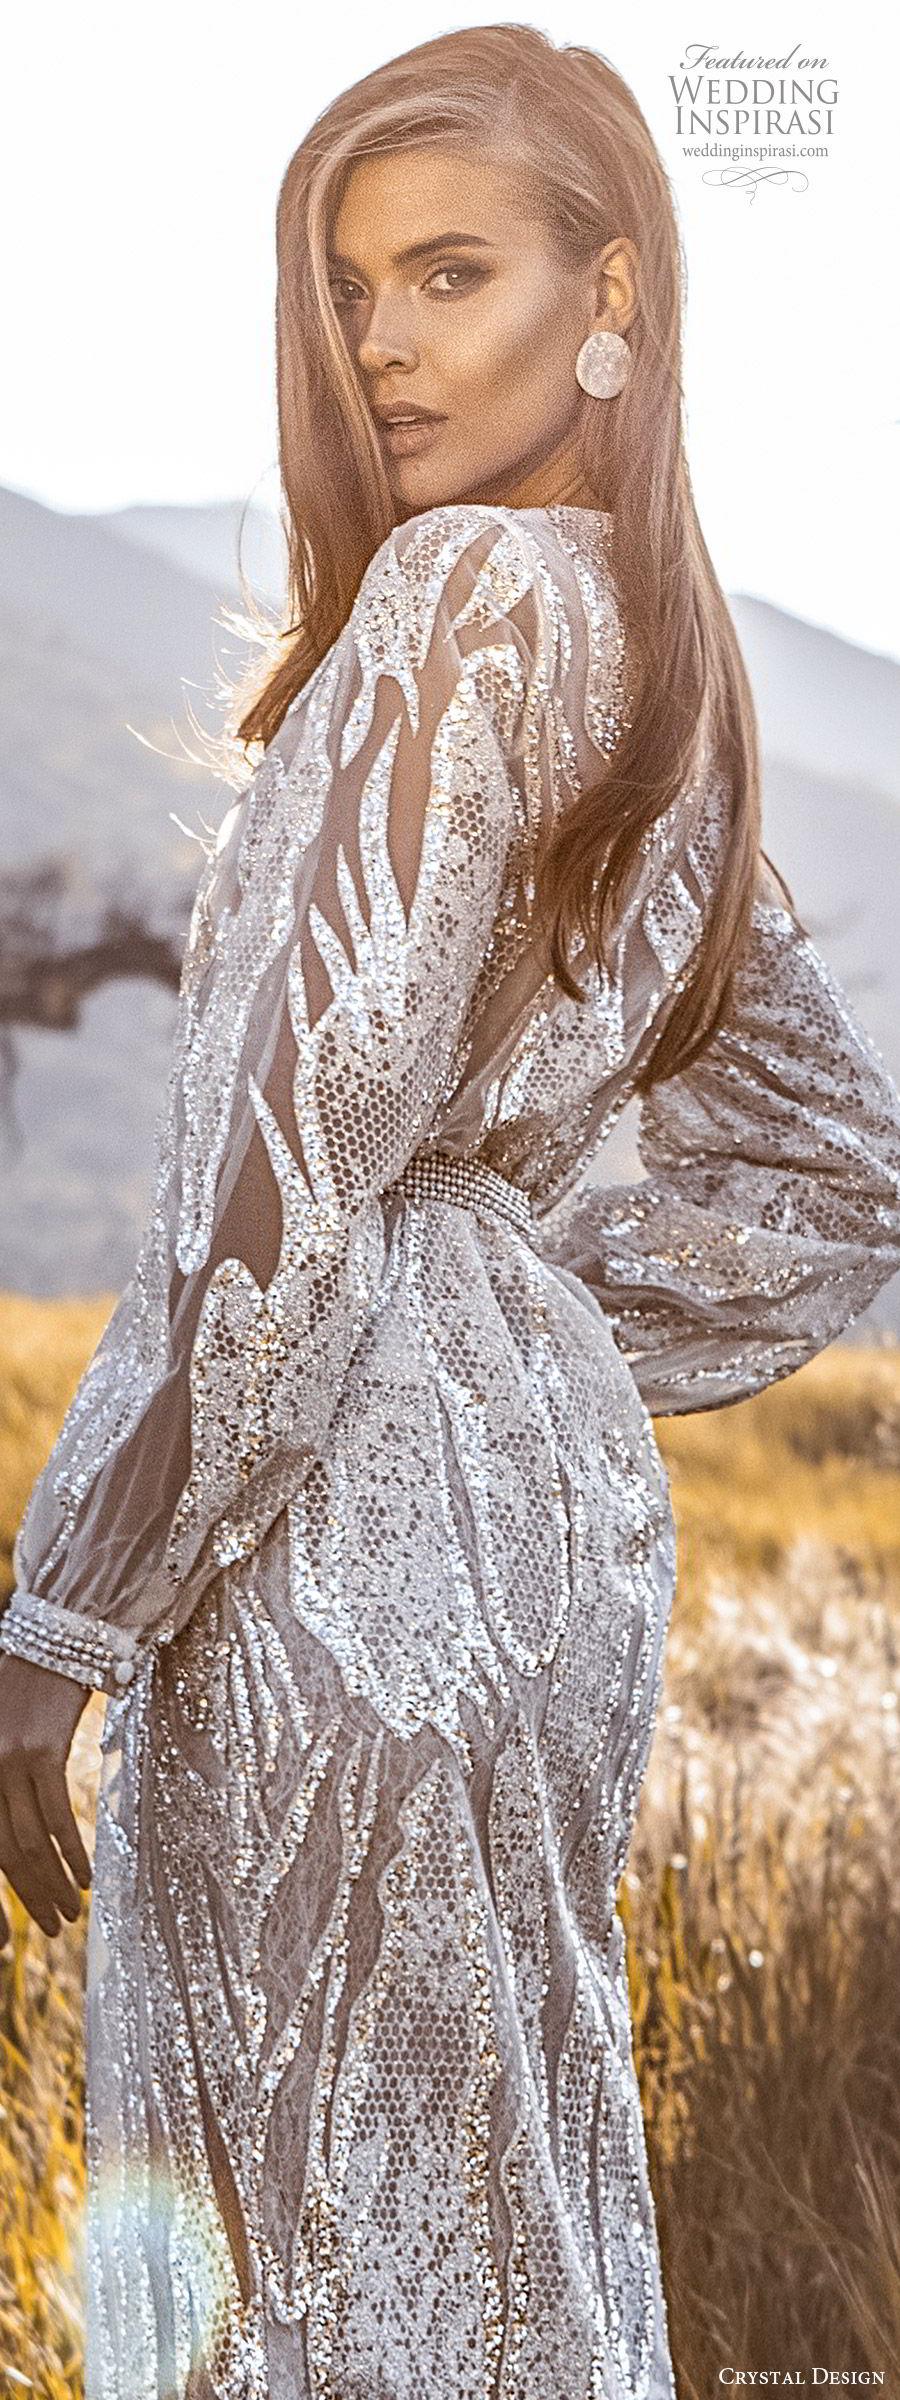 crystal design 2020 couture bridal long sleeves surplice v neckline fully embellished sheath wedding dress (3) glam elegant slit skirt sweep train beaded belt zbv